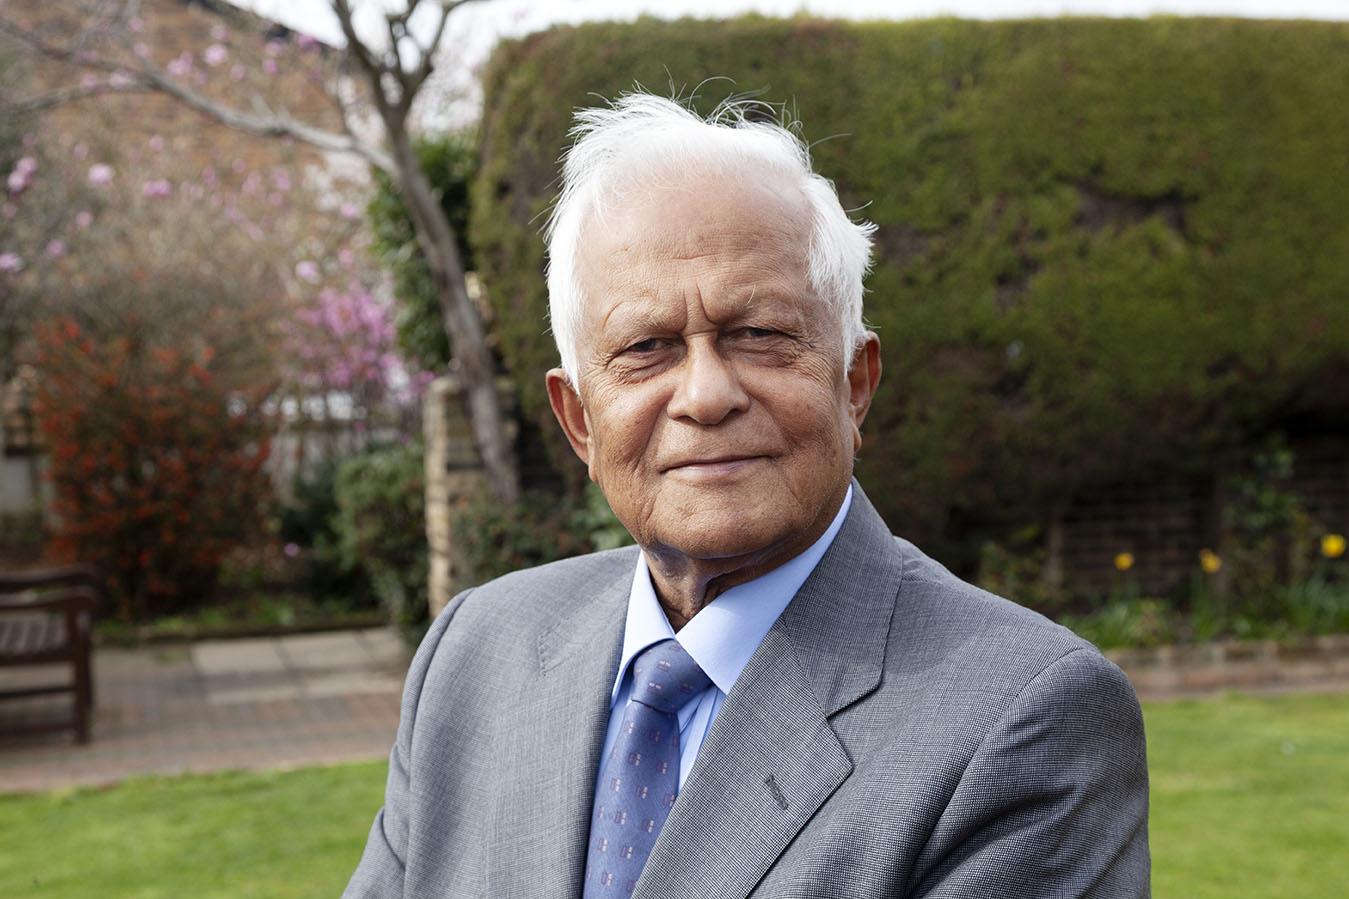 Mr. C. Juwaheer profile picture